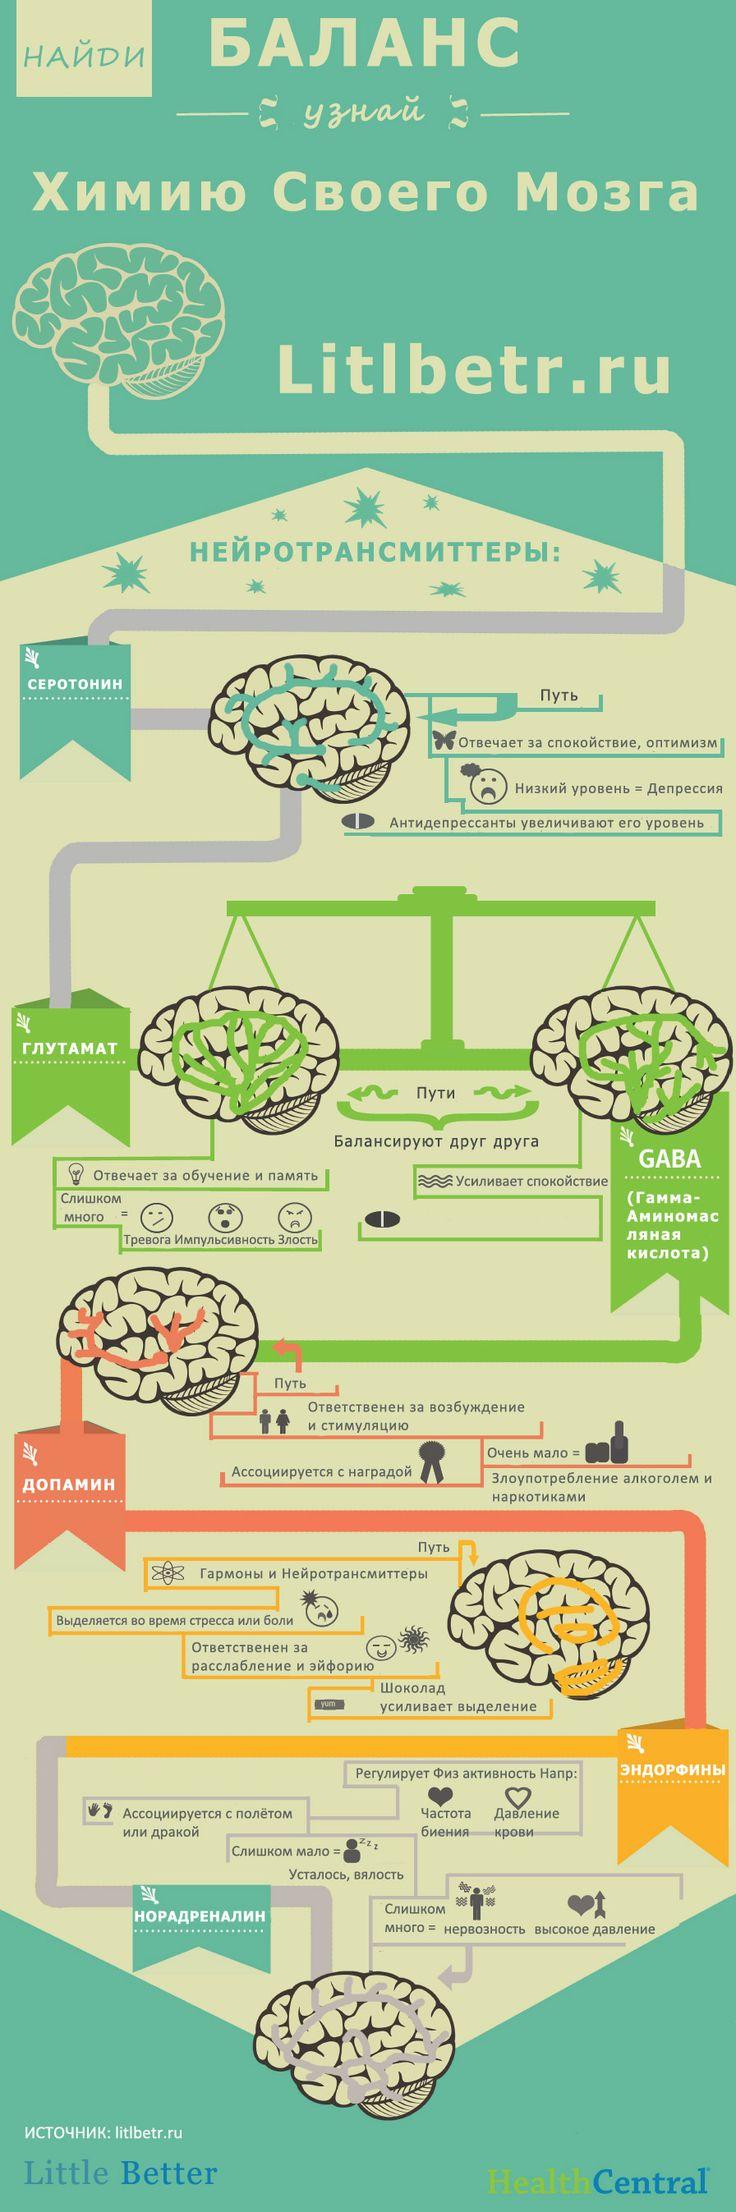 BrainChemistry2